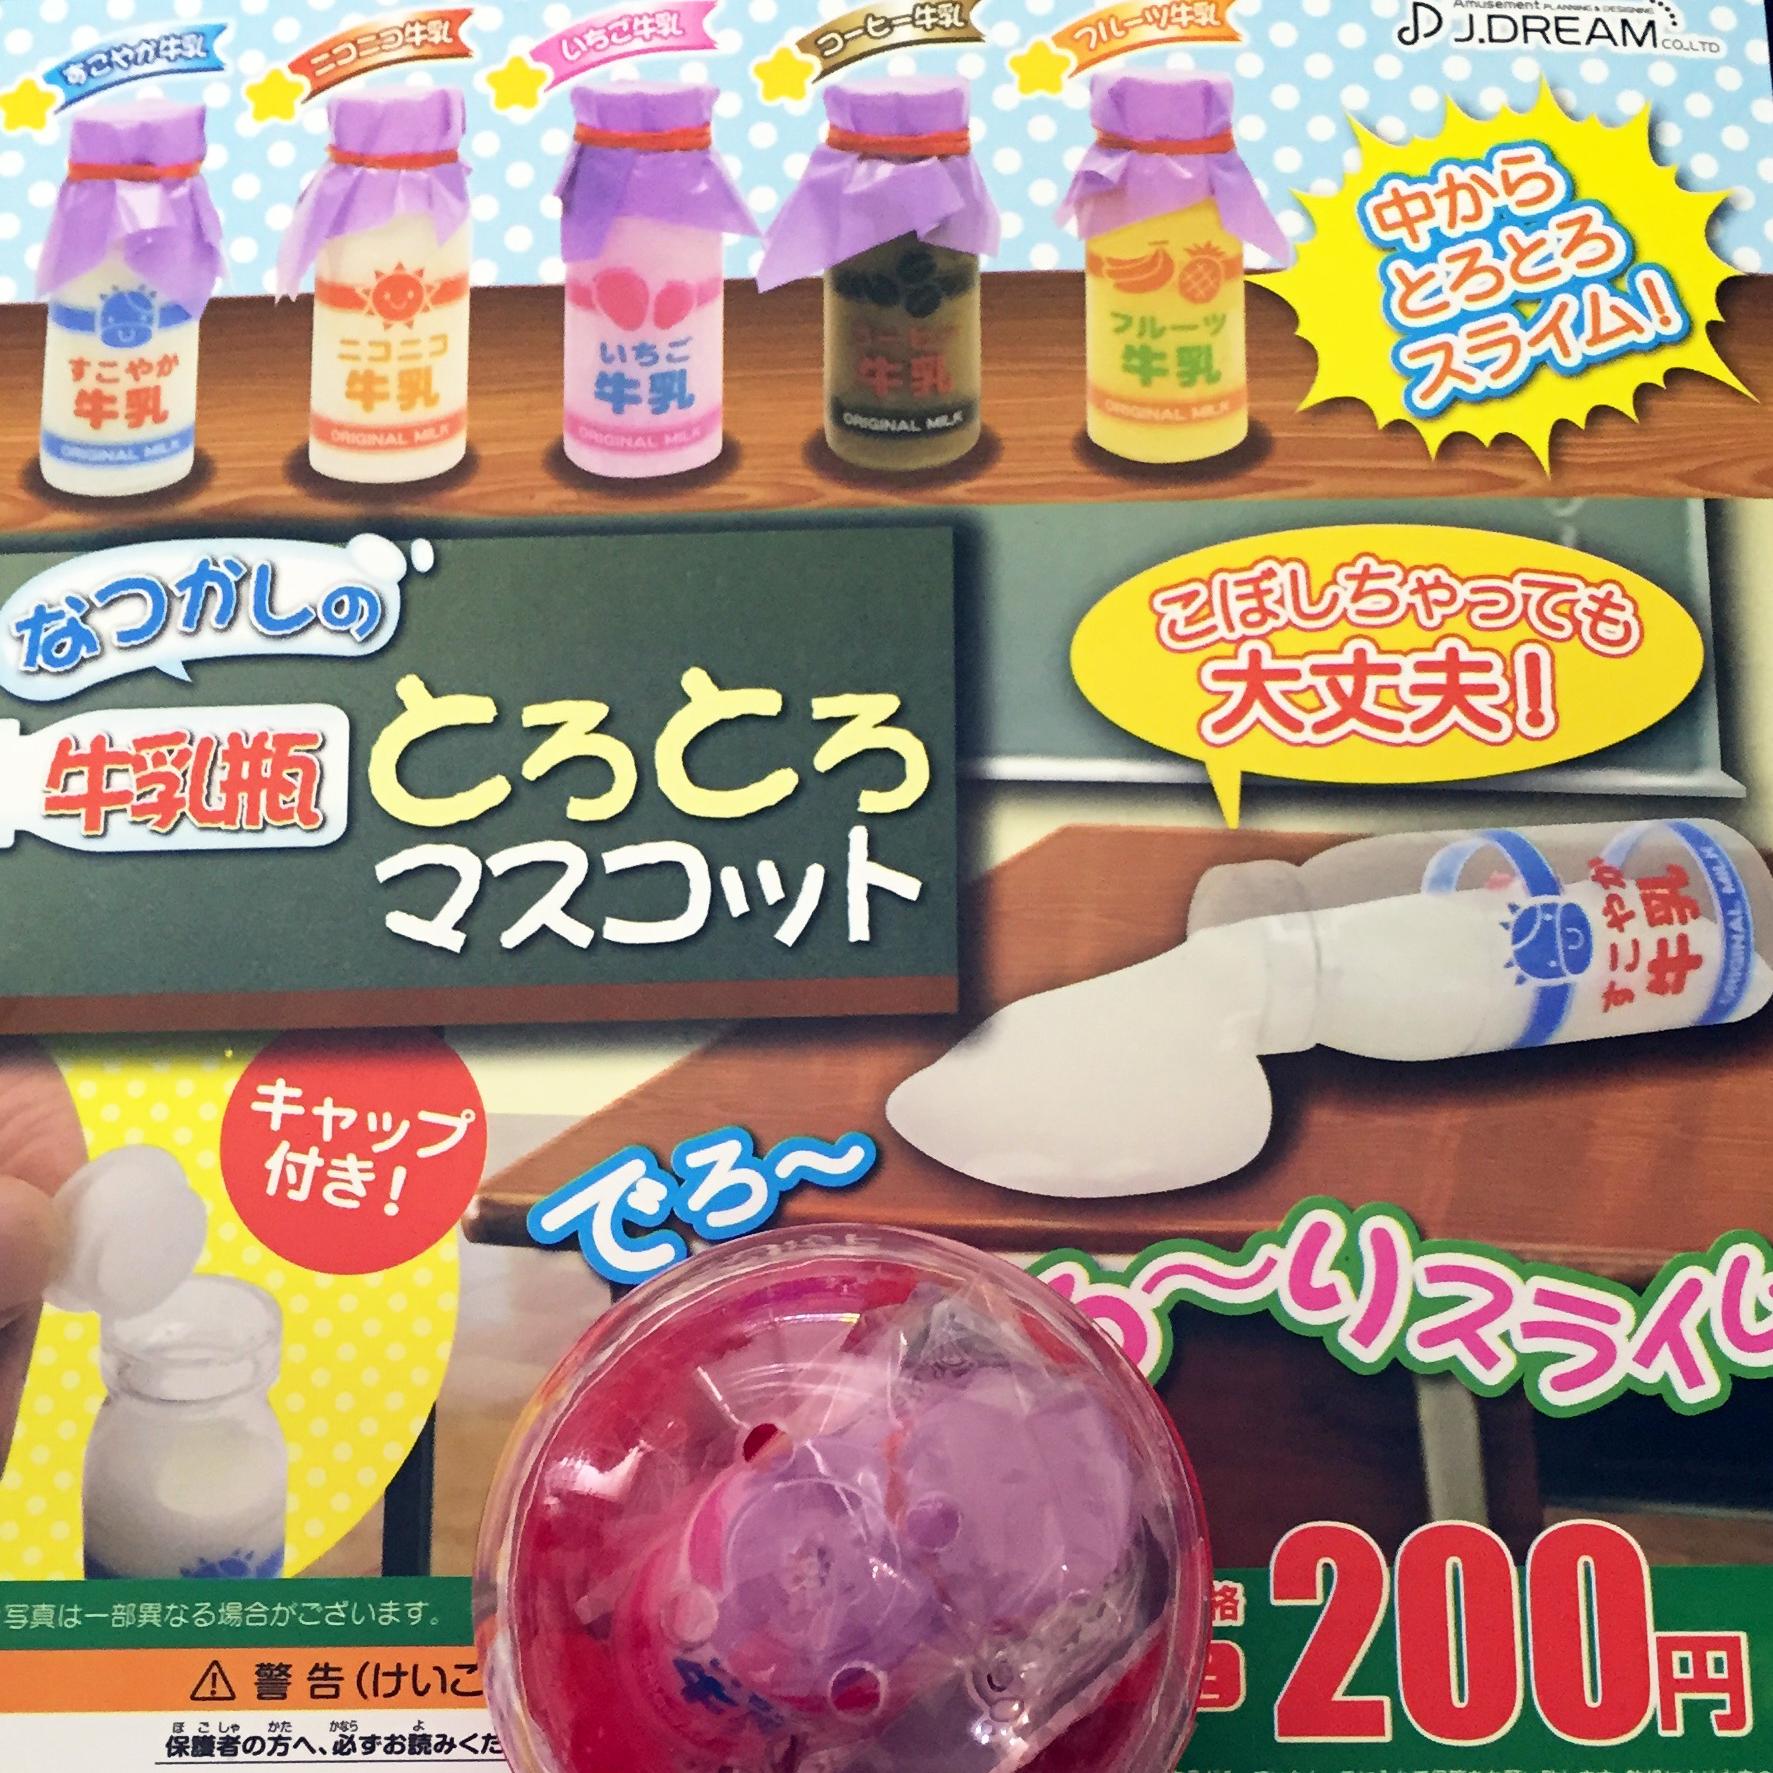 Japan Licensed Little Jdream Milk Bottle Fun Slime Limited See